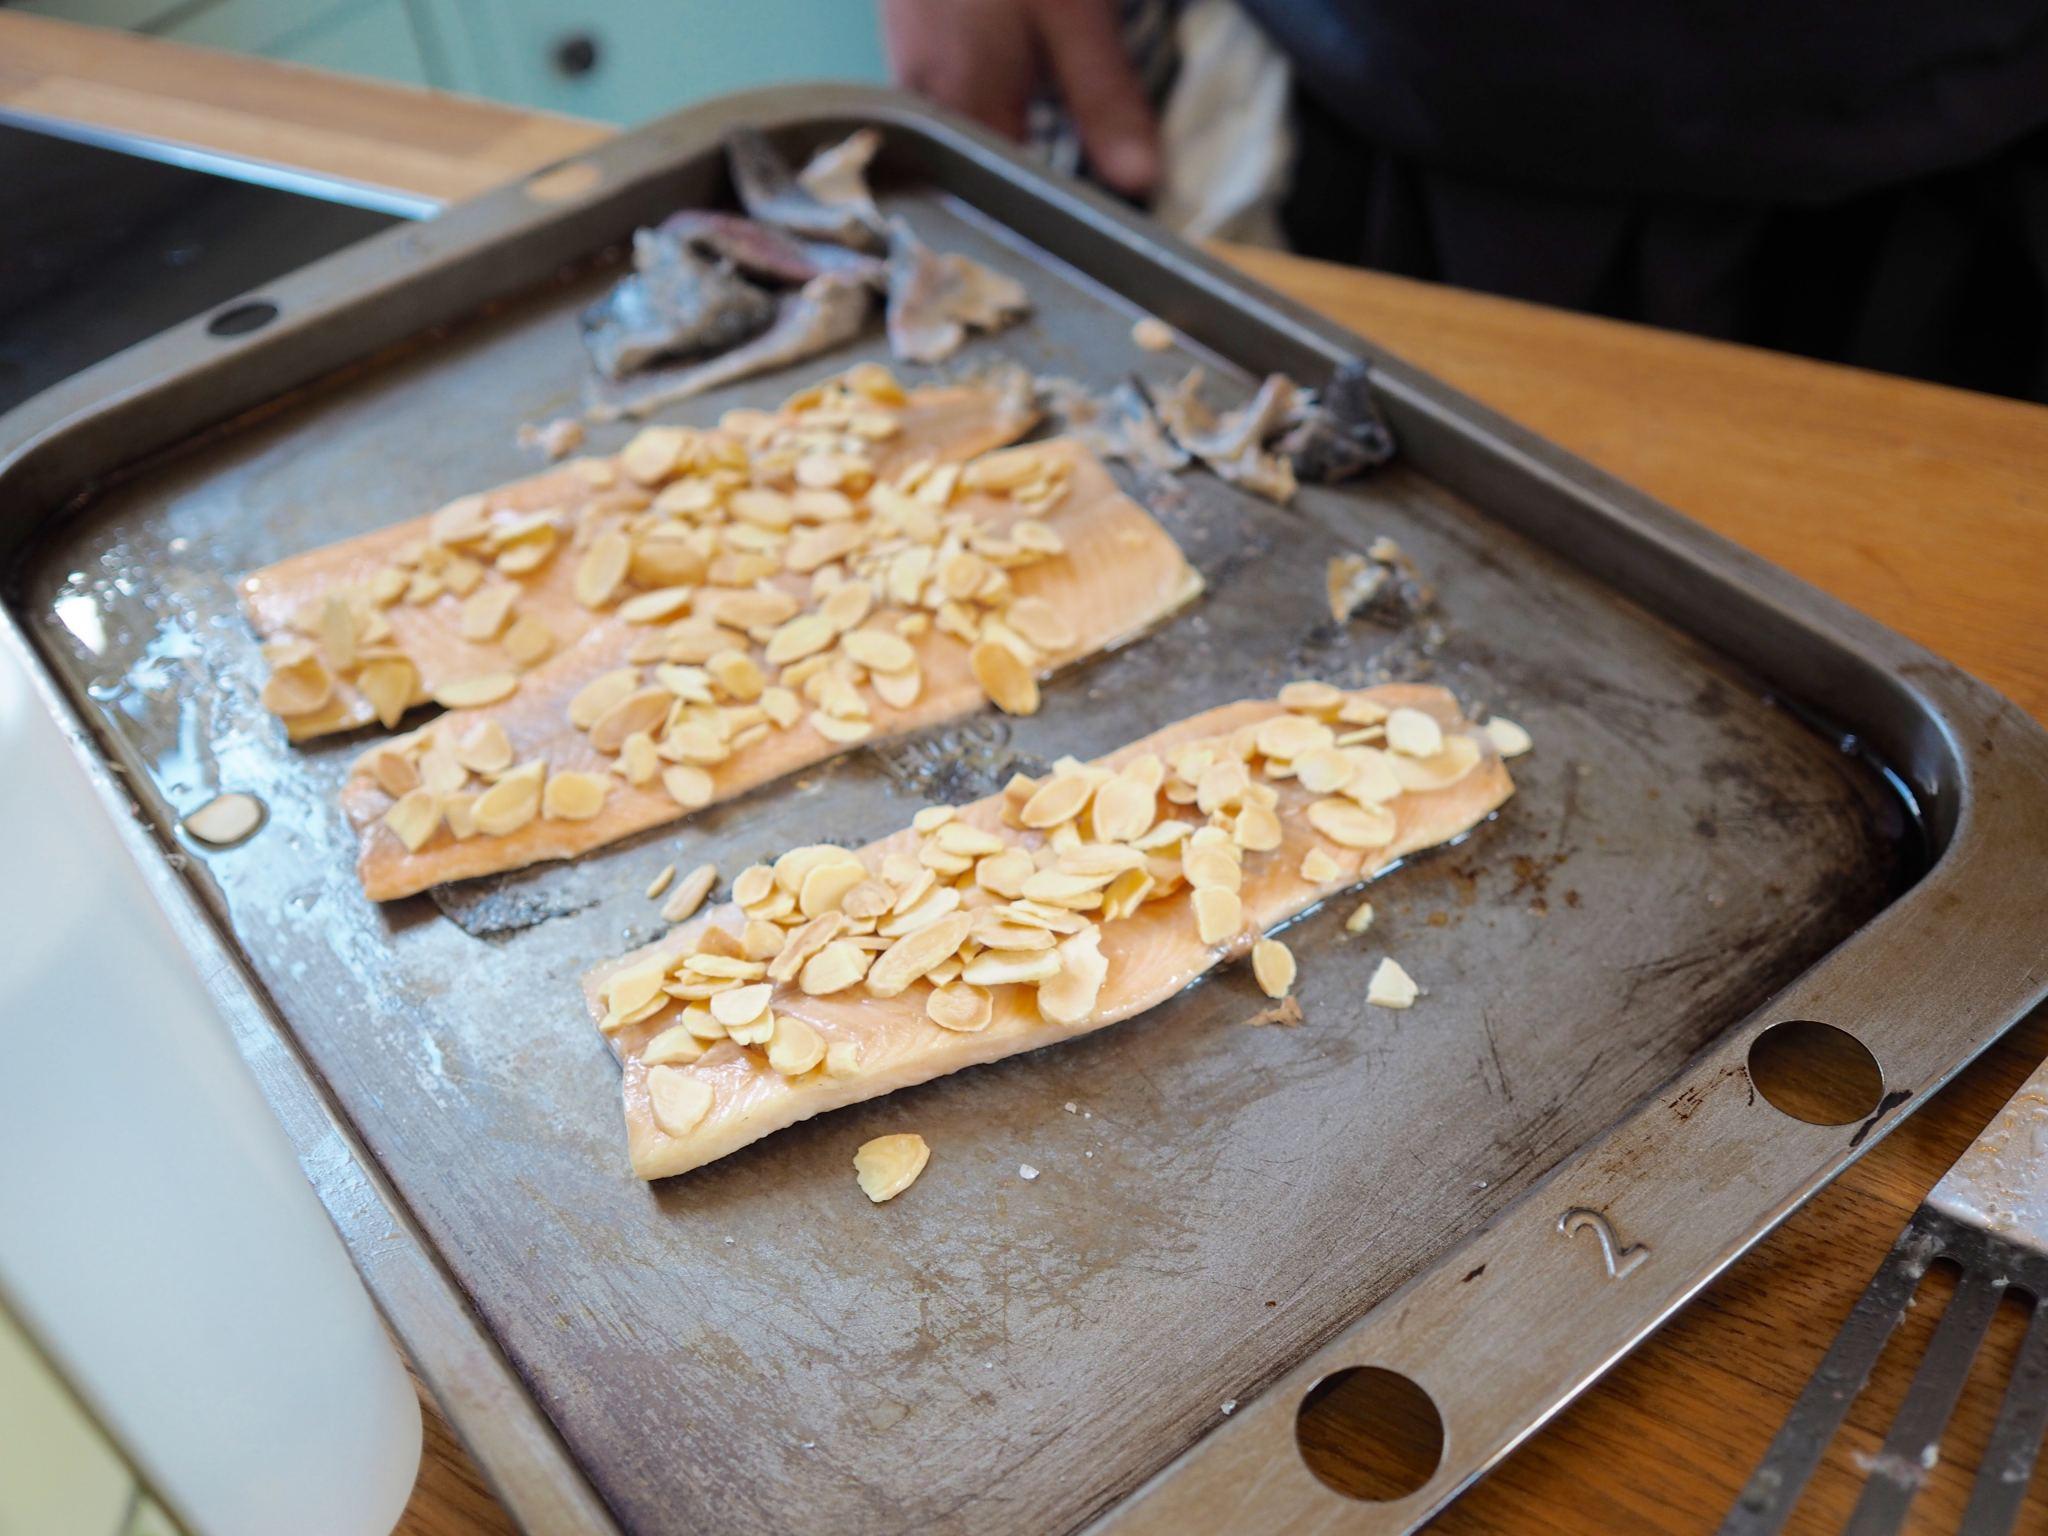 Chelsea Iceland School of fish cooking school neil nugent almonds